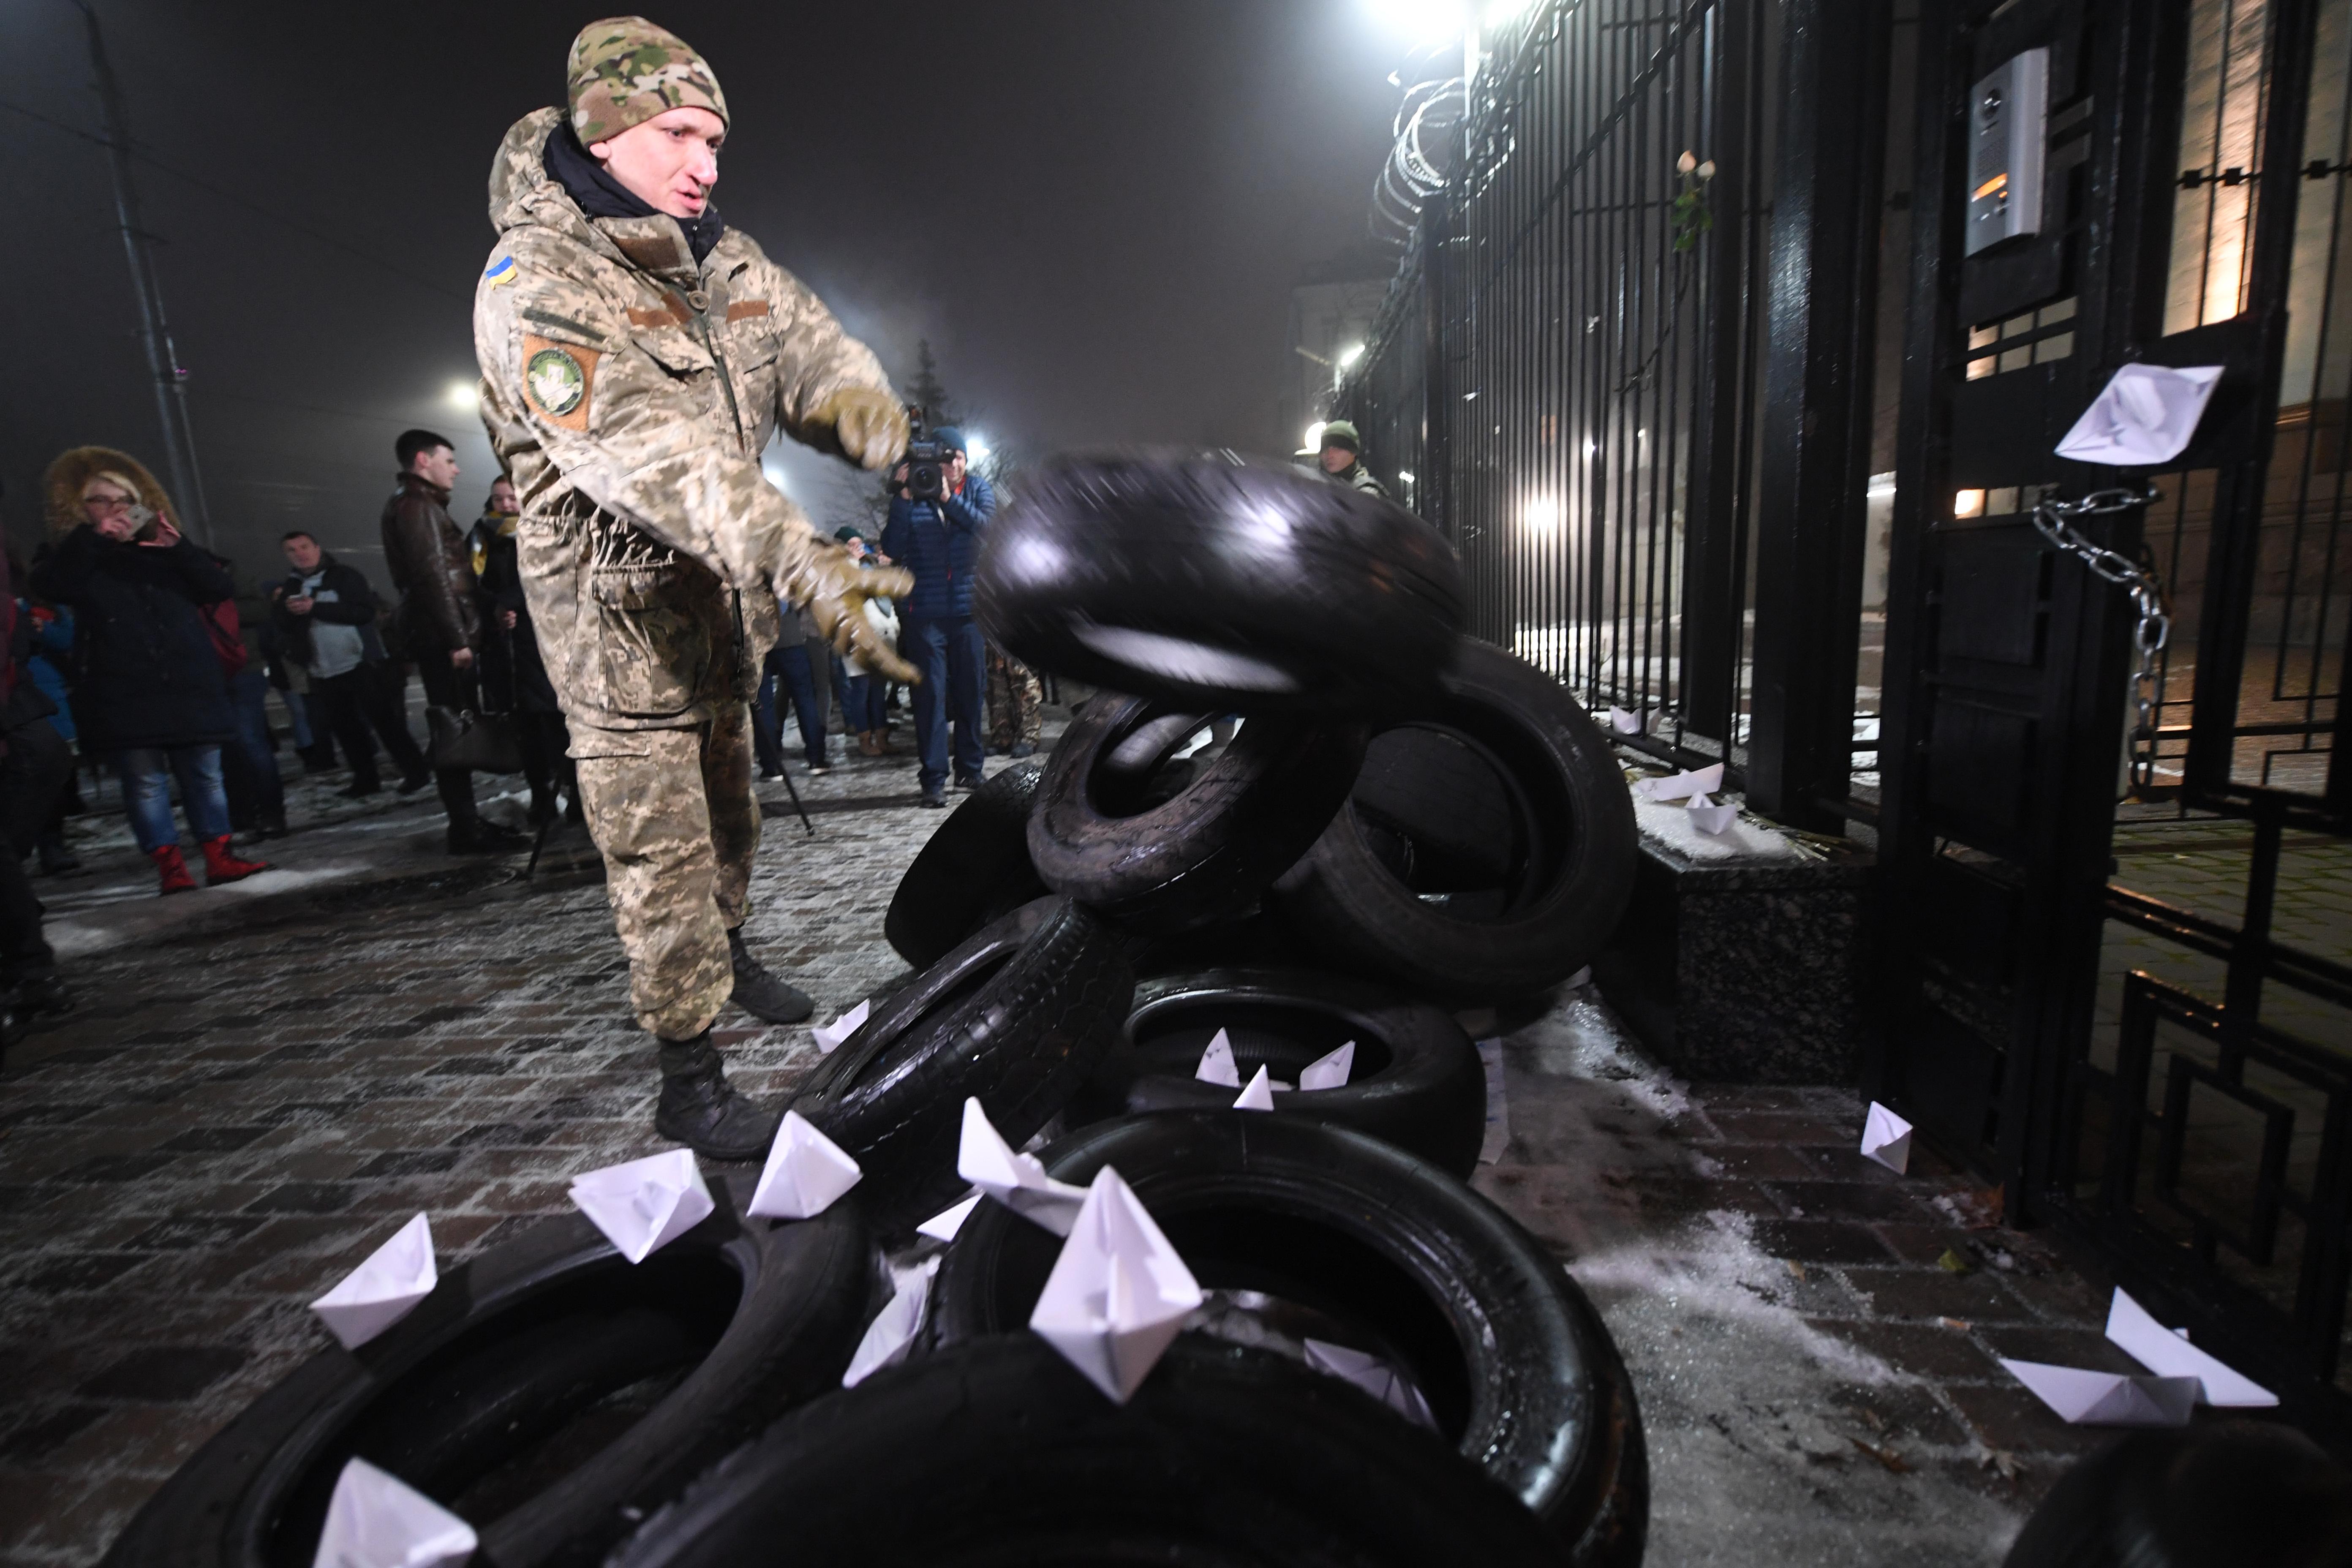 Россия Азов денгизида Украина кемаларини қўлга олганидан кейин зиддият кучайди